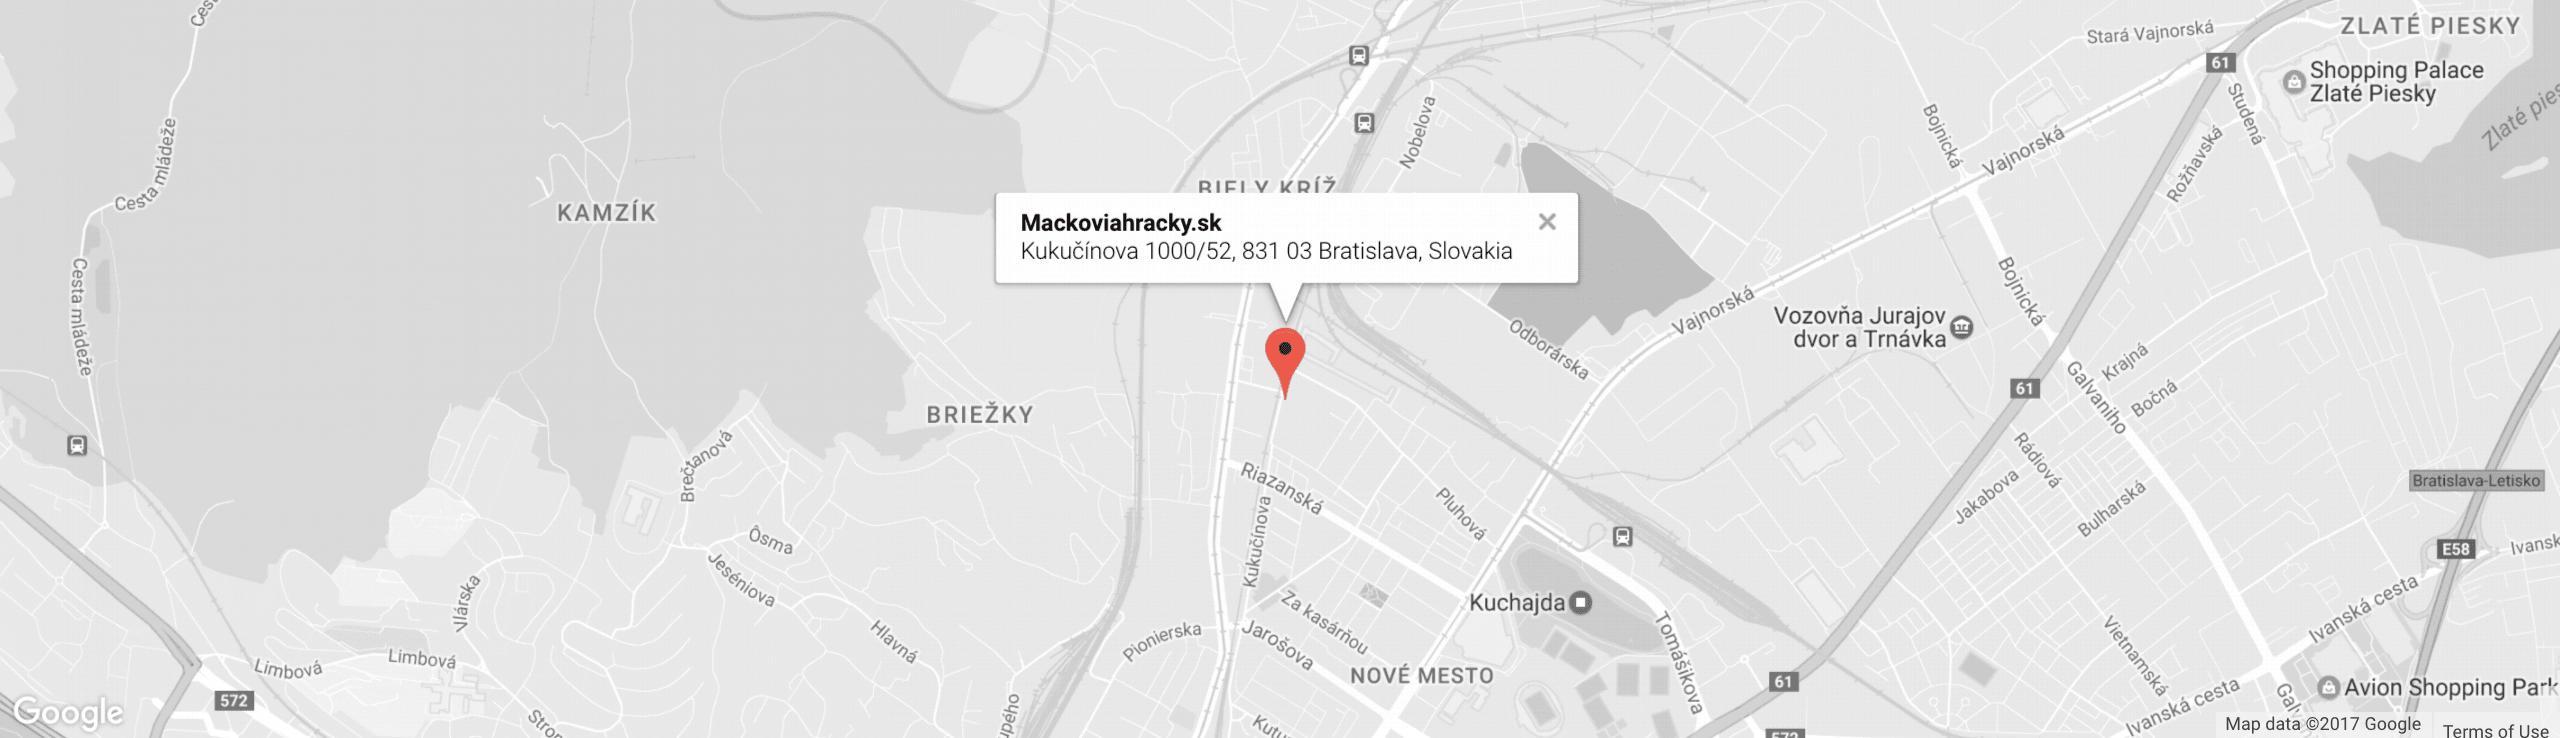 Mapa a kontakt